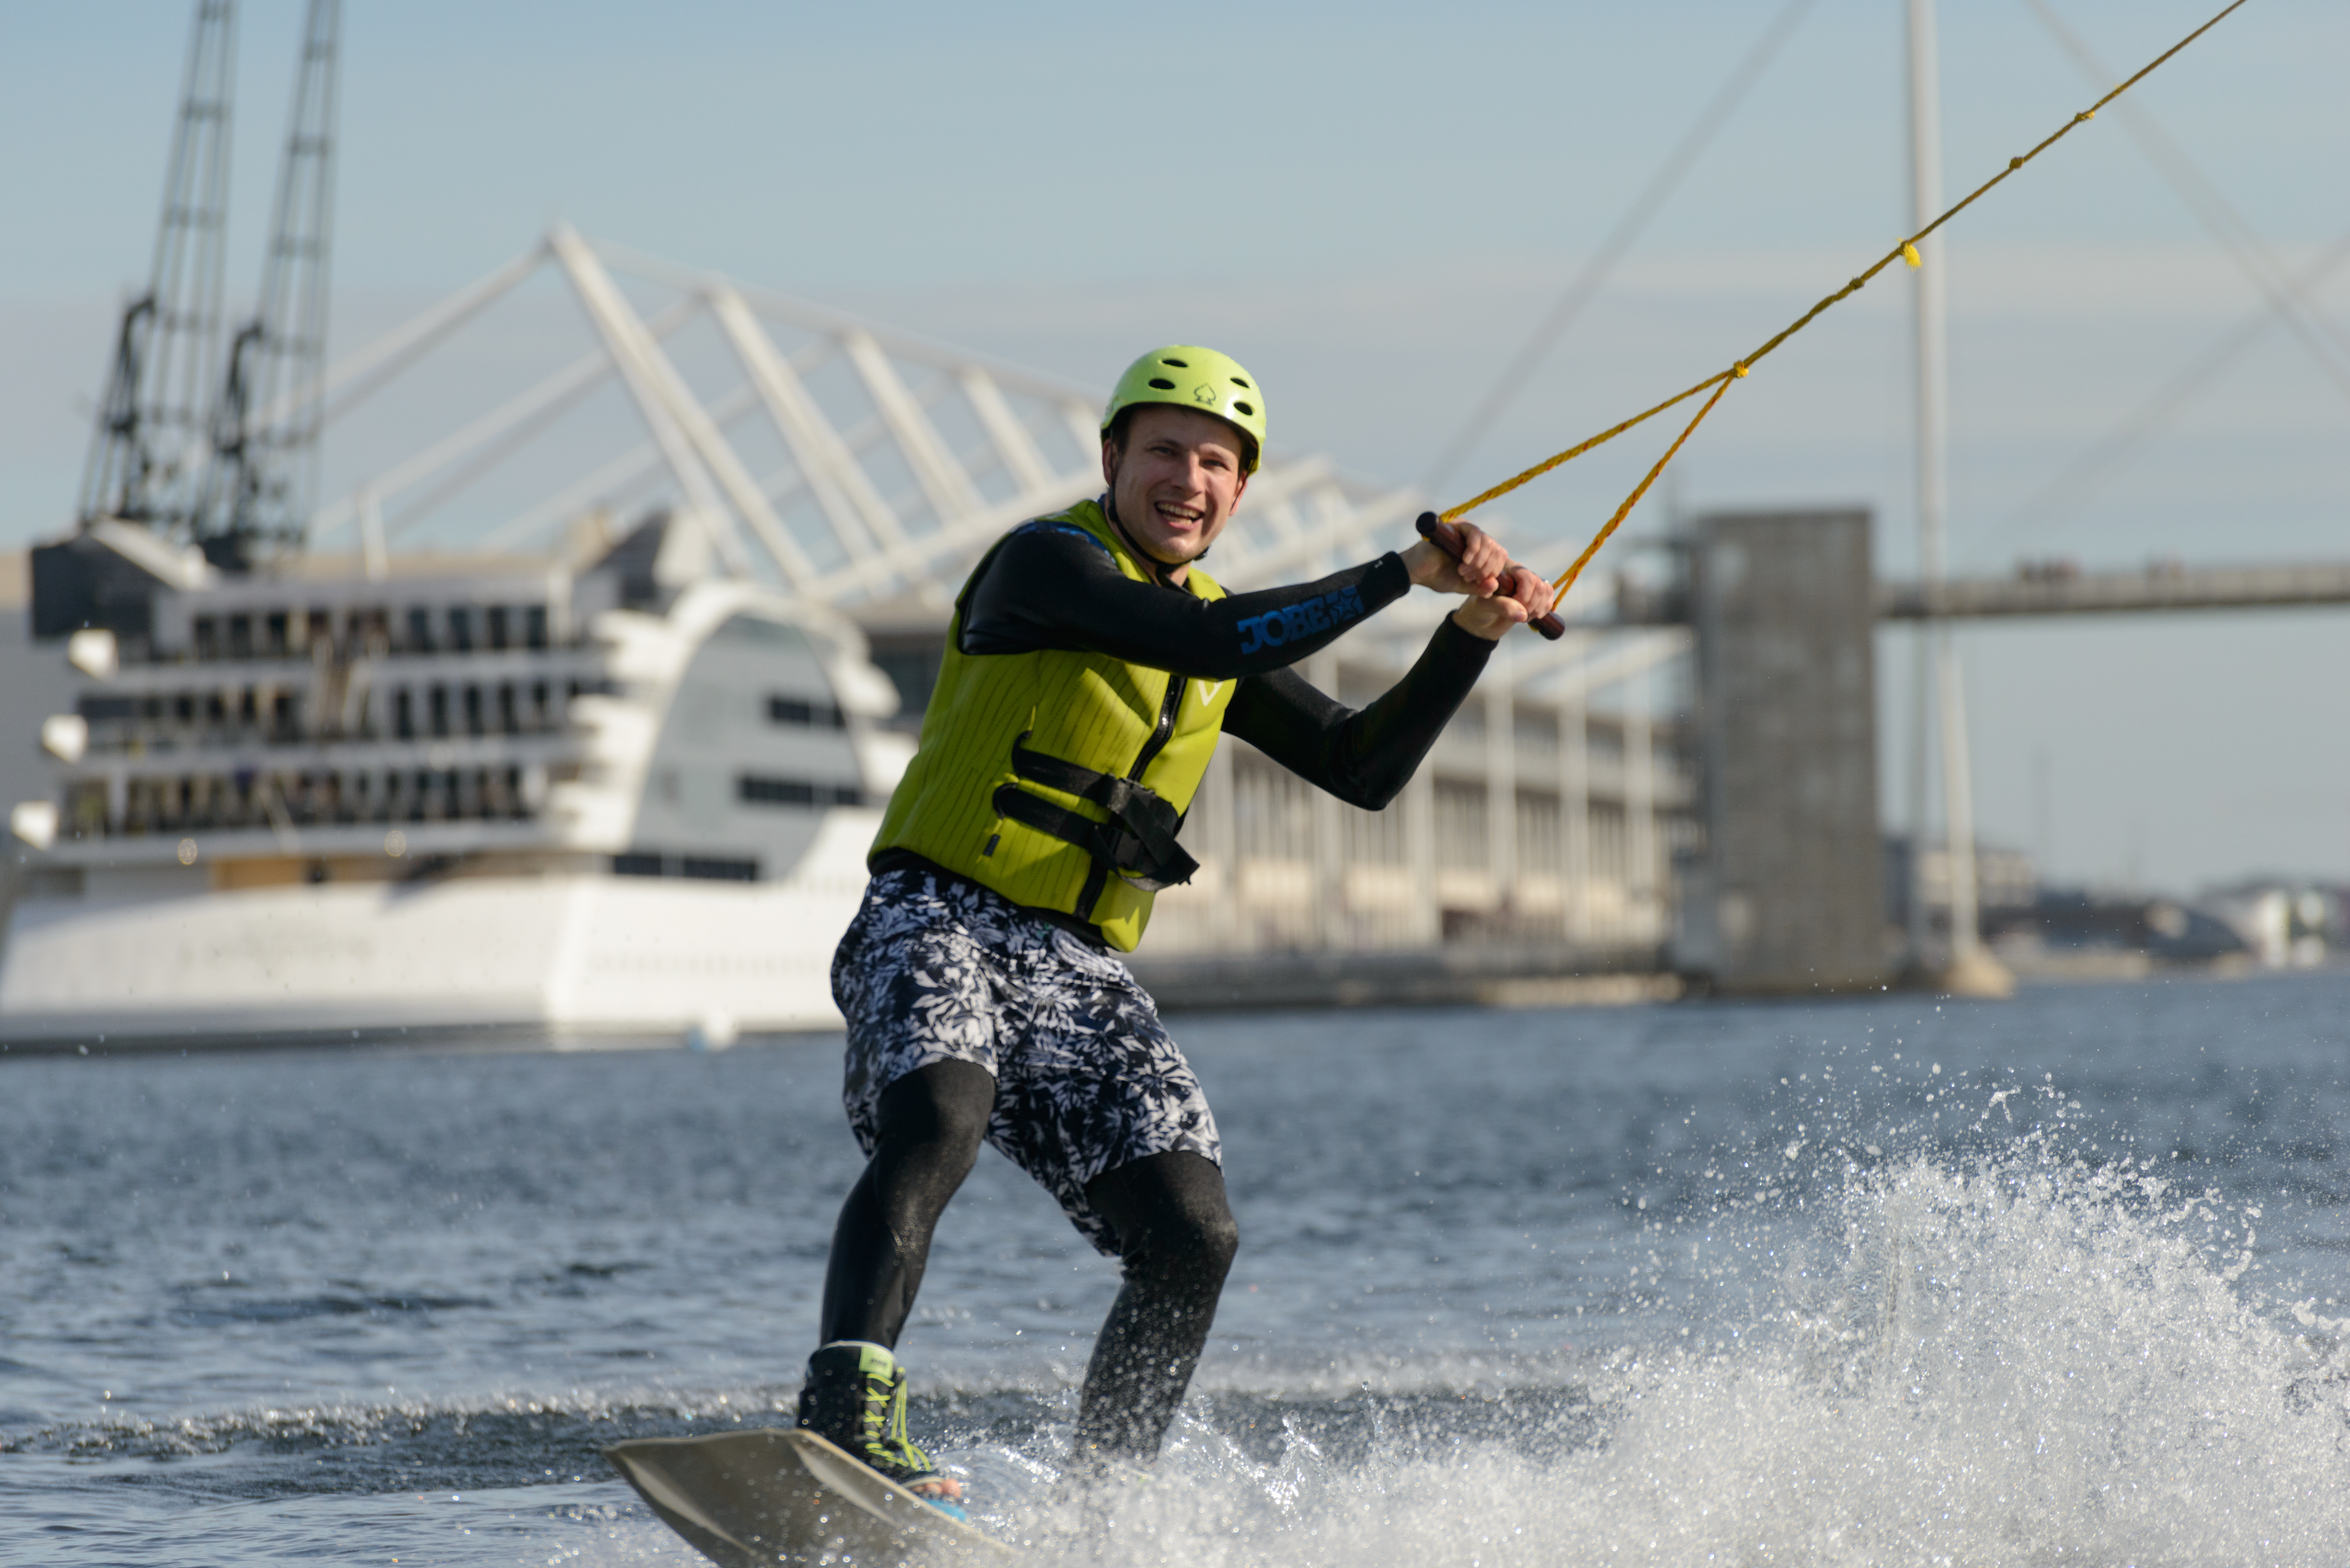 Wakeboarding in Royal Docks